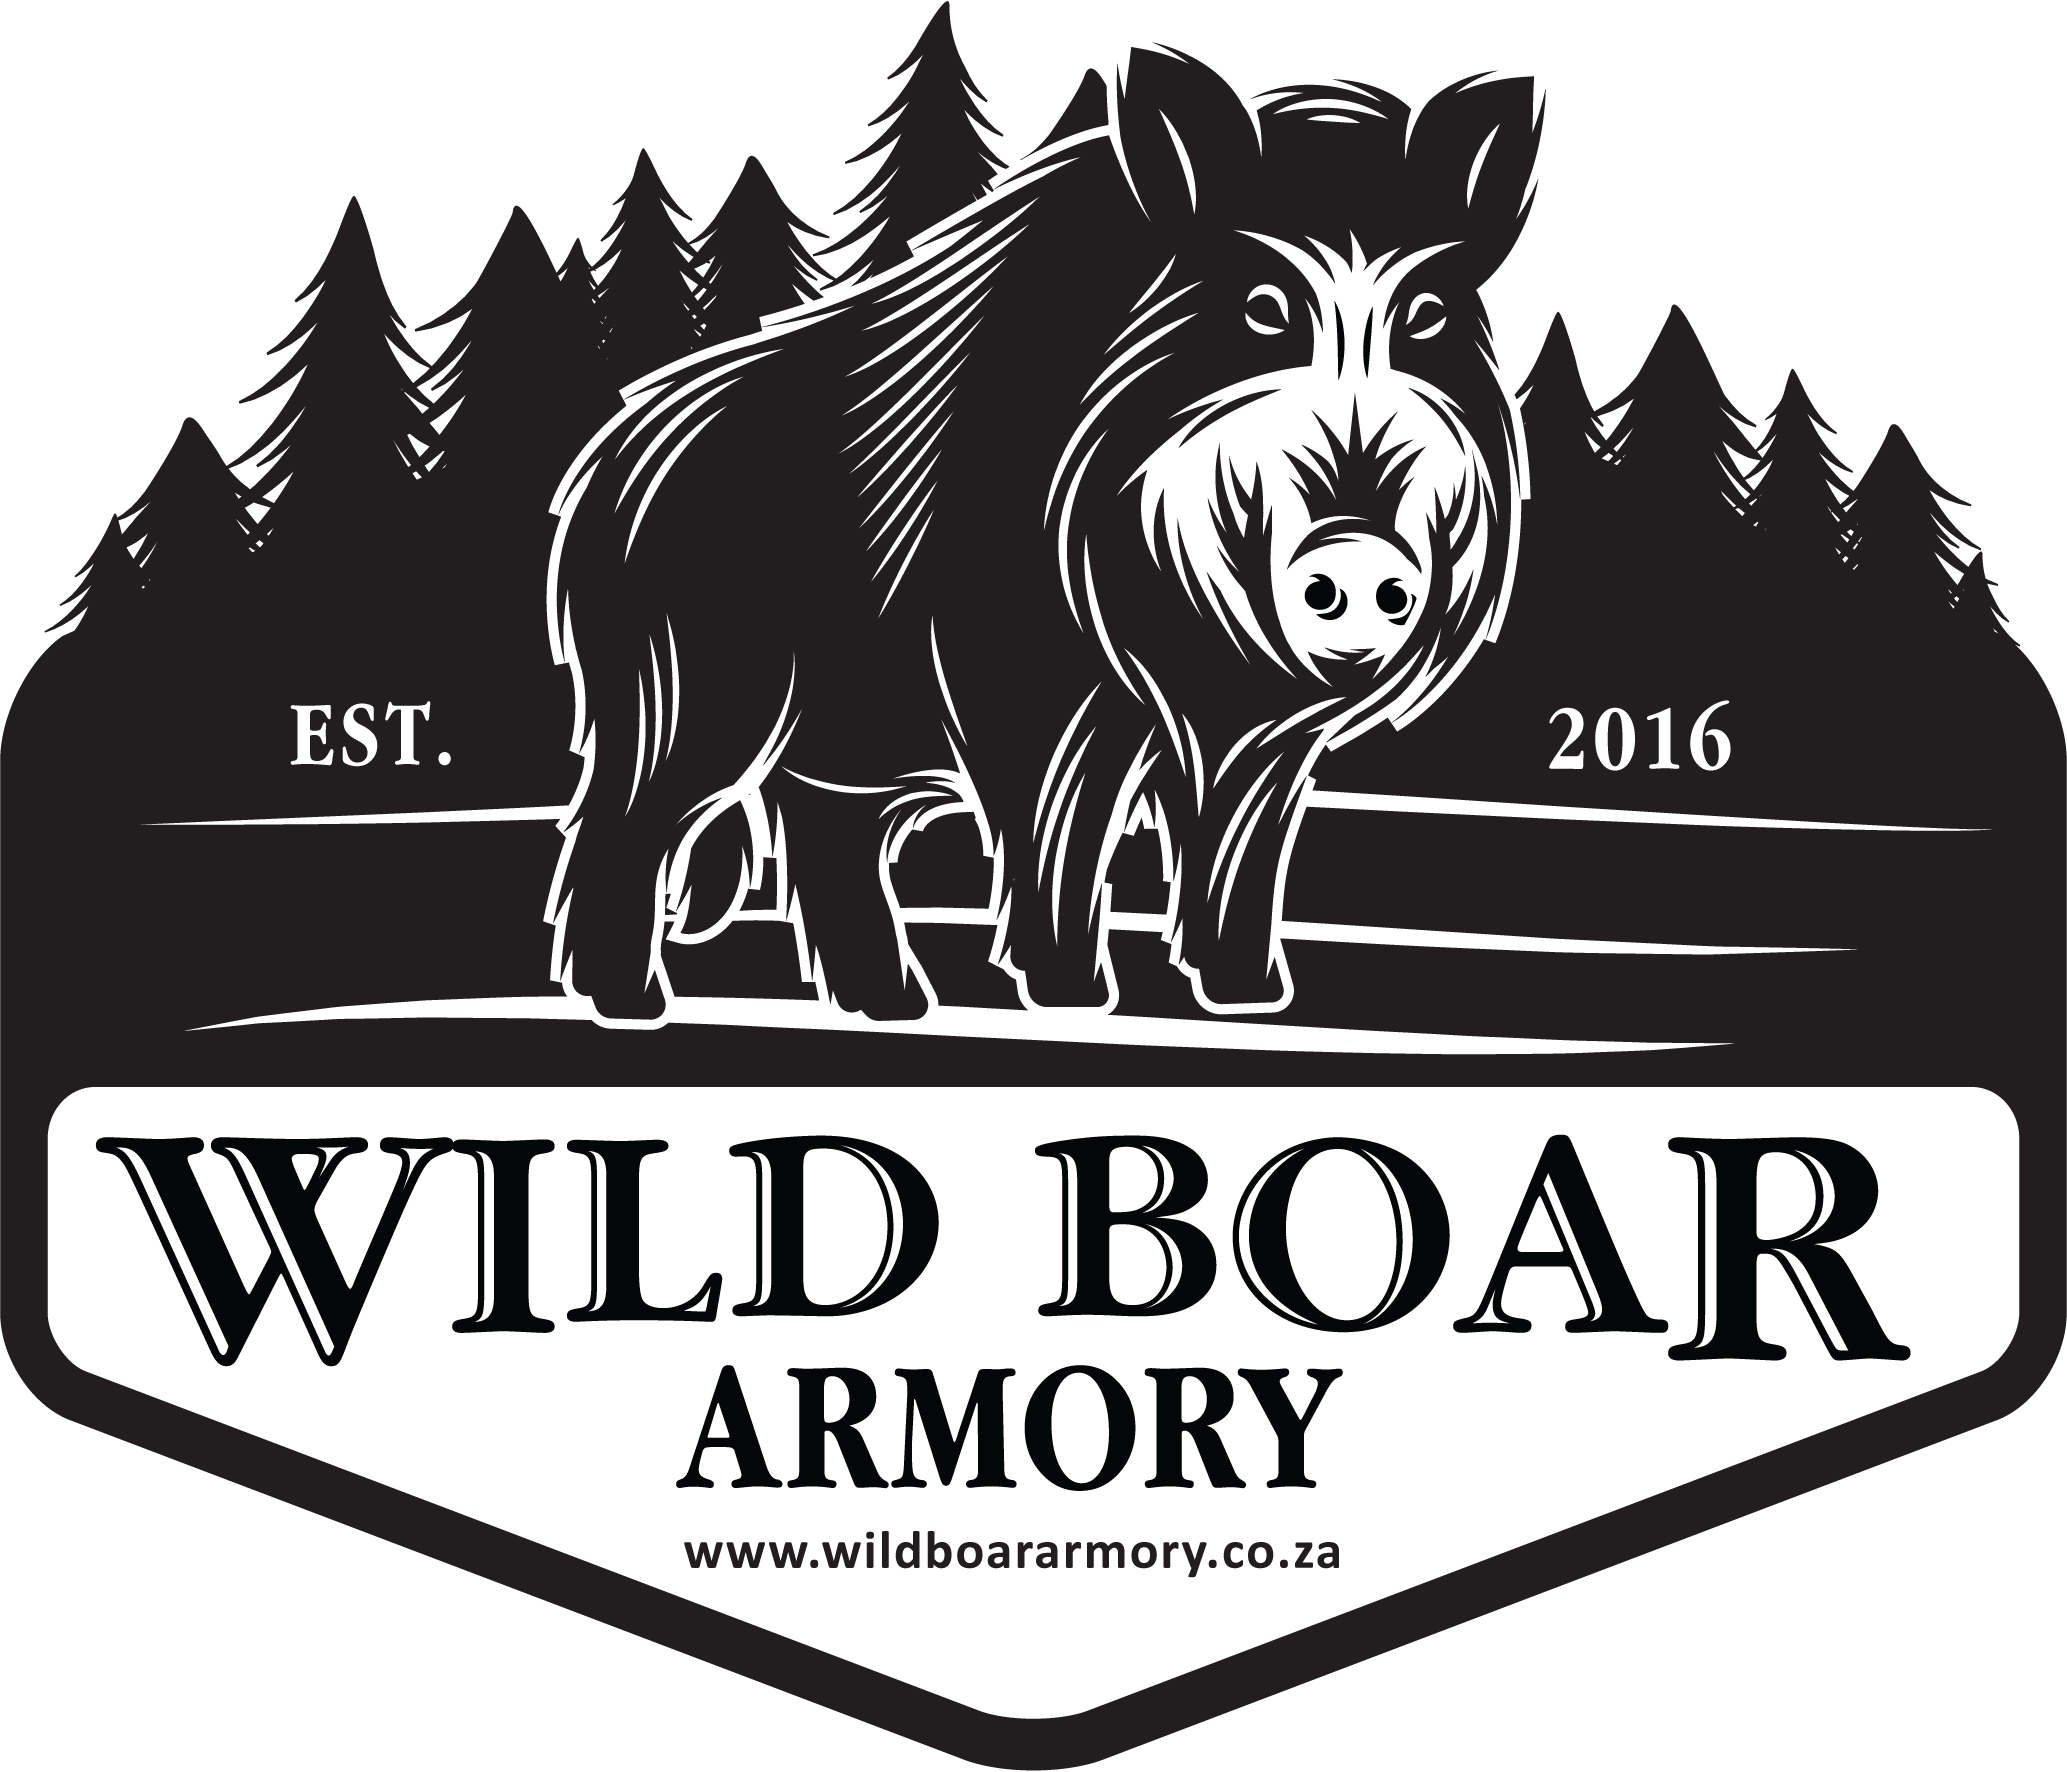 Wild Boar Armory